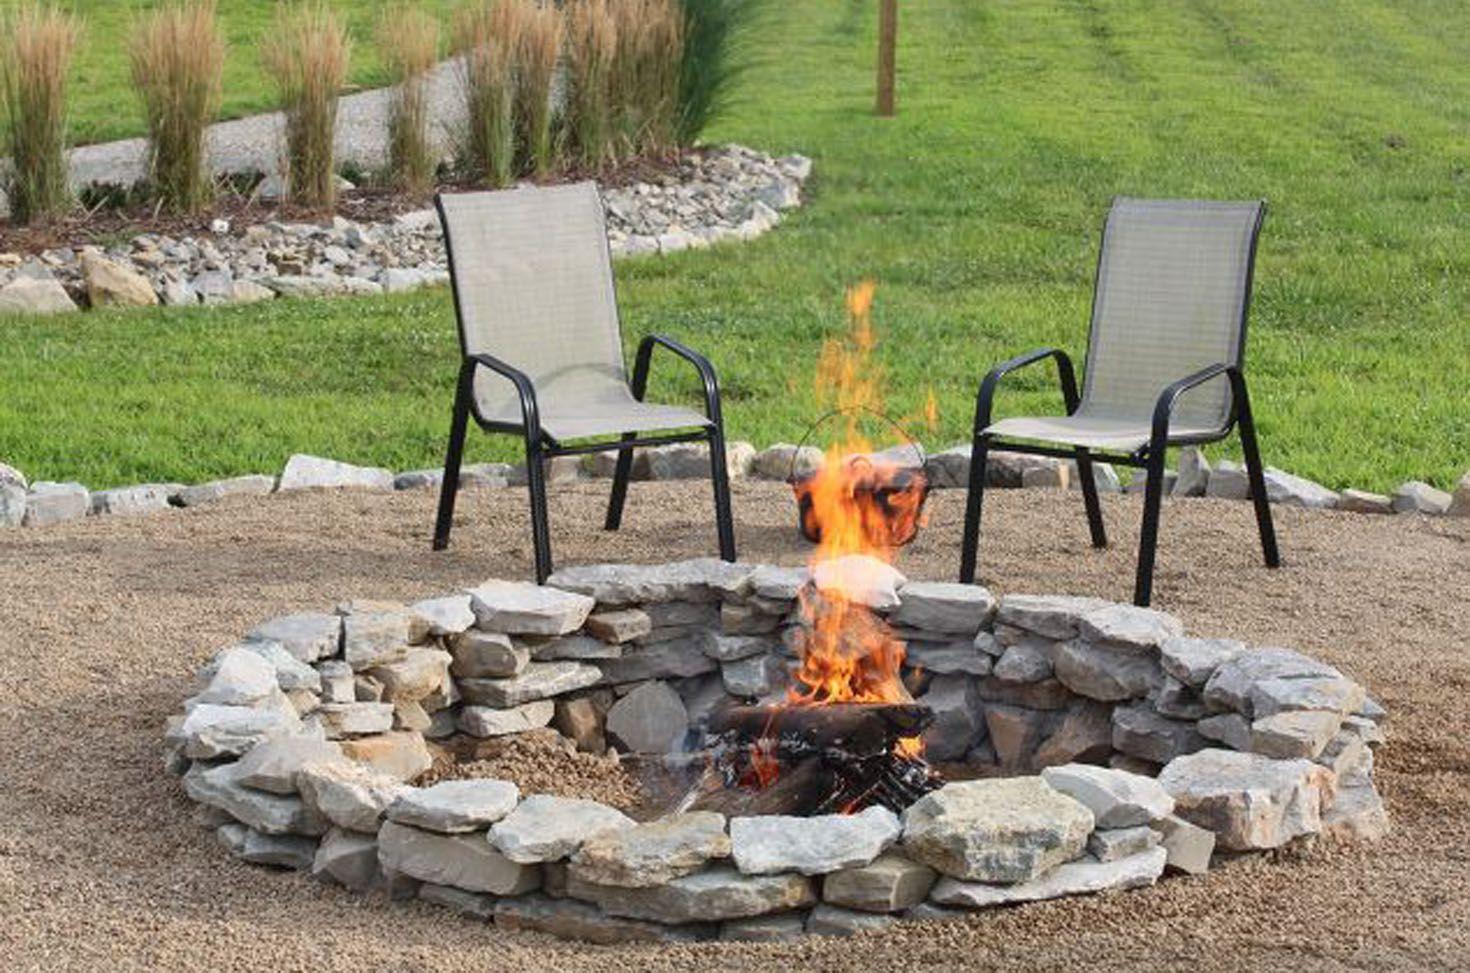 backyard ideas 67 diy backyard design ideas - diy backyard decor tips INDYUVY